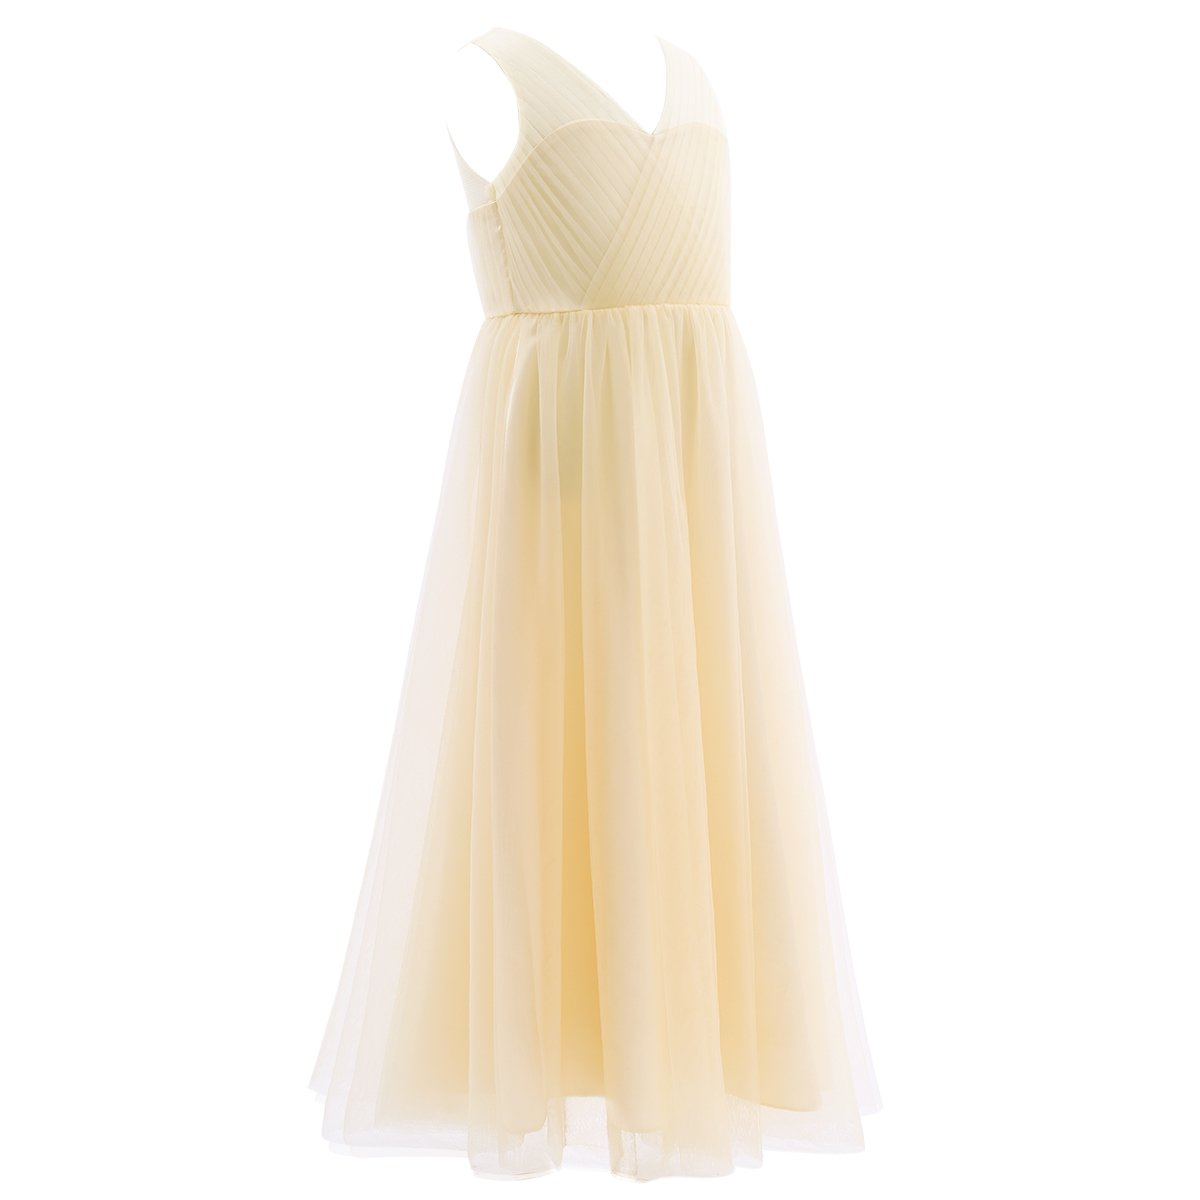 inlzdz Women Girls High Waist Flowy Fringe Tassels Latin Skirt Tango Rumba Skirt Performance Dancewear